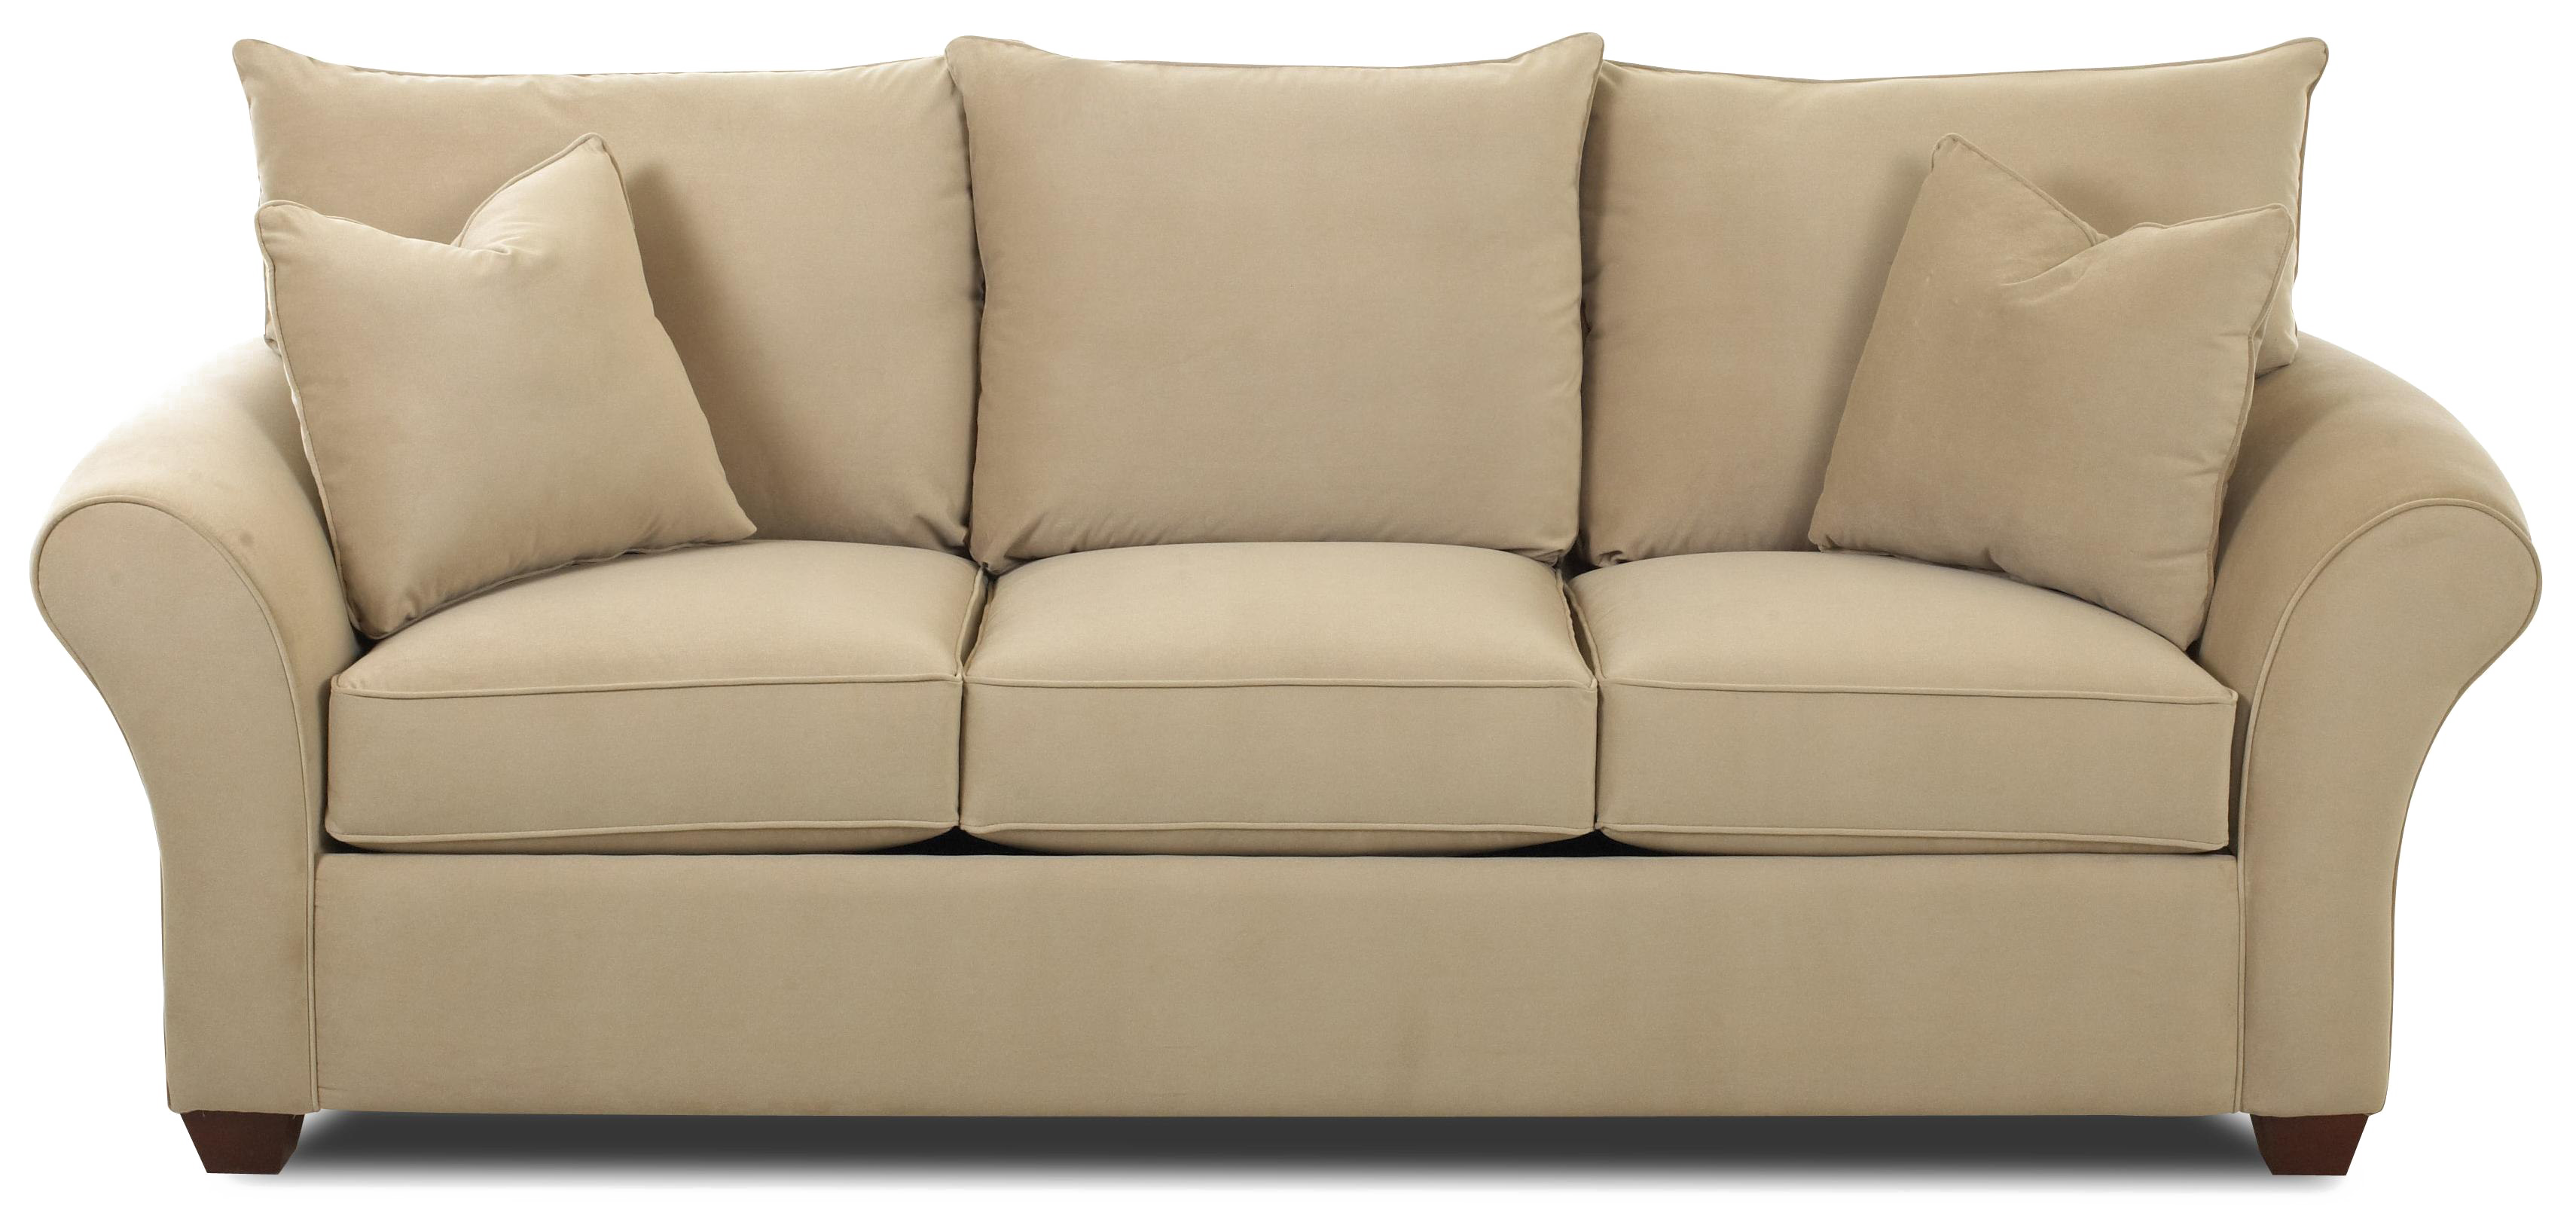 Sleeper Sofa Transparent Images PNG SVG Clip arts